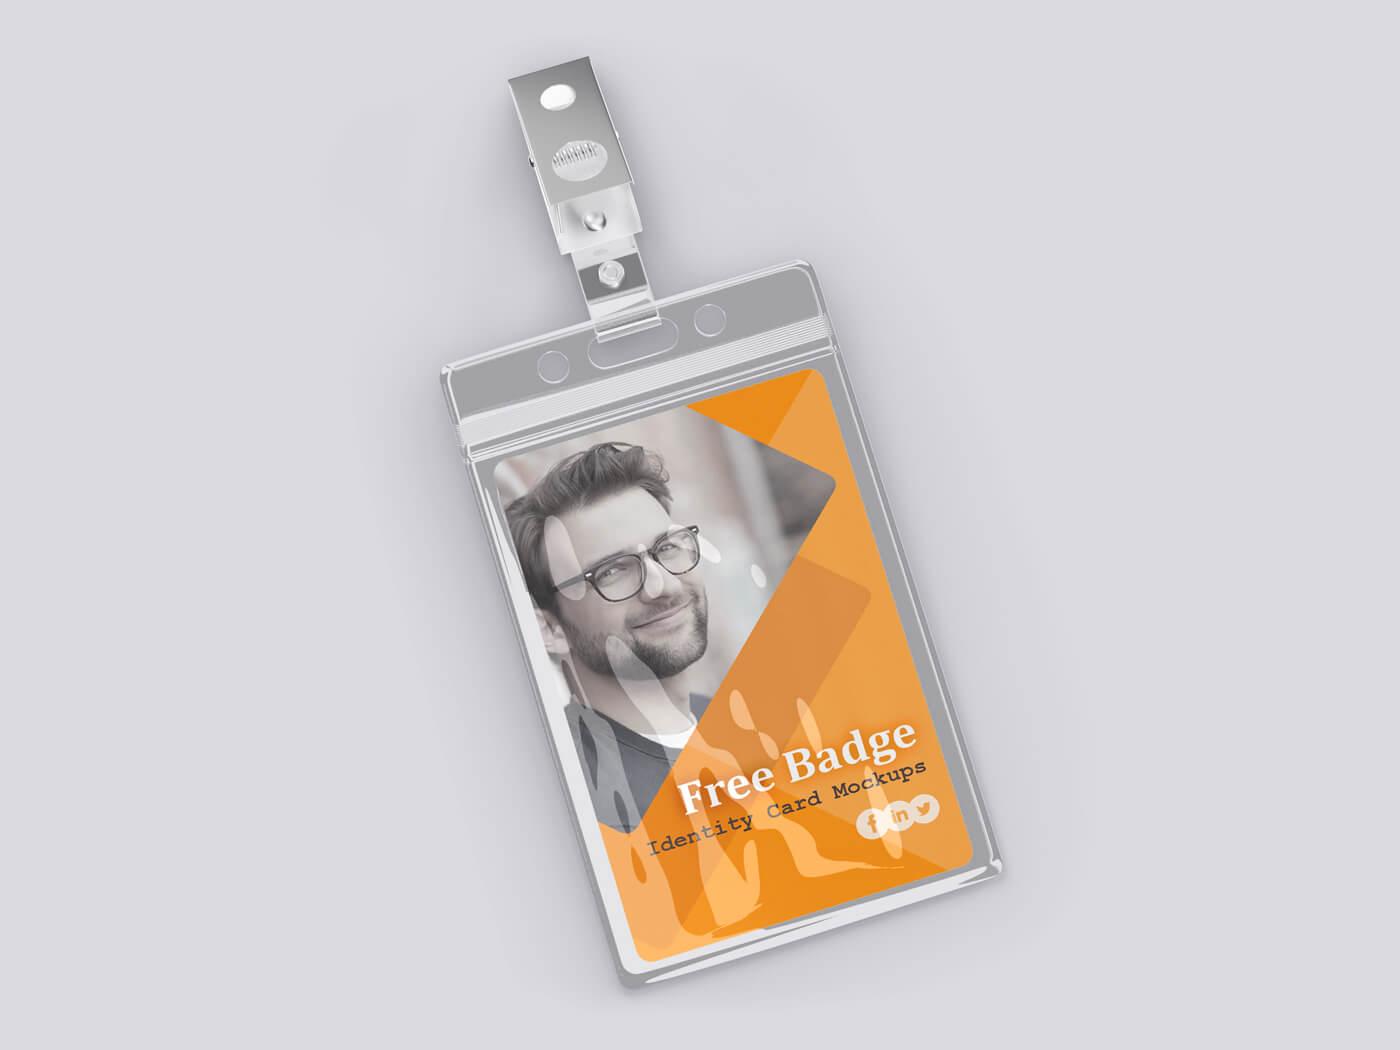 Badge Identity Card Mockup 03